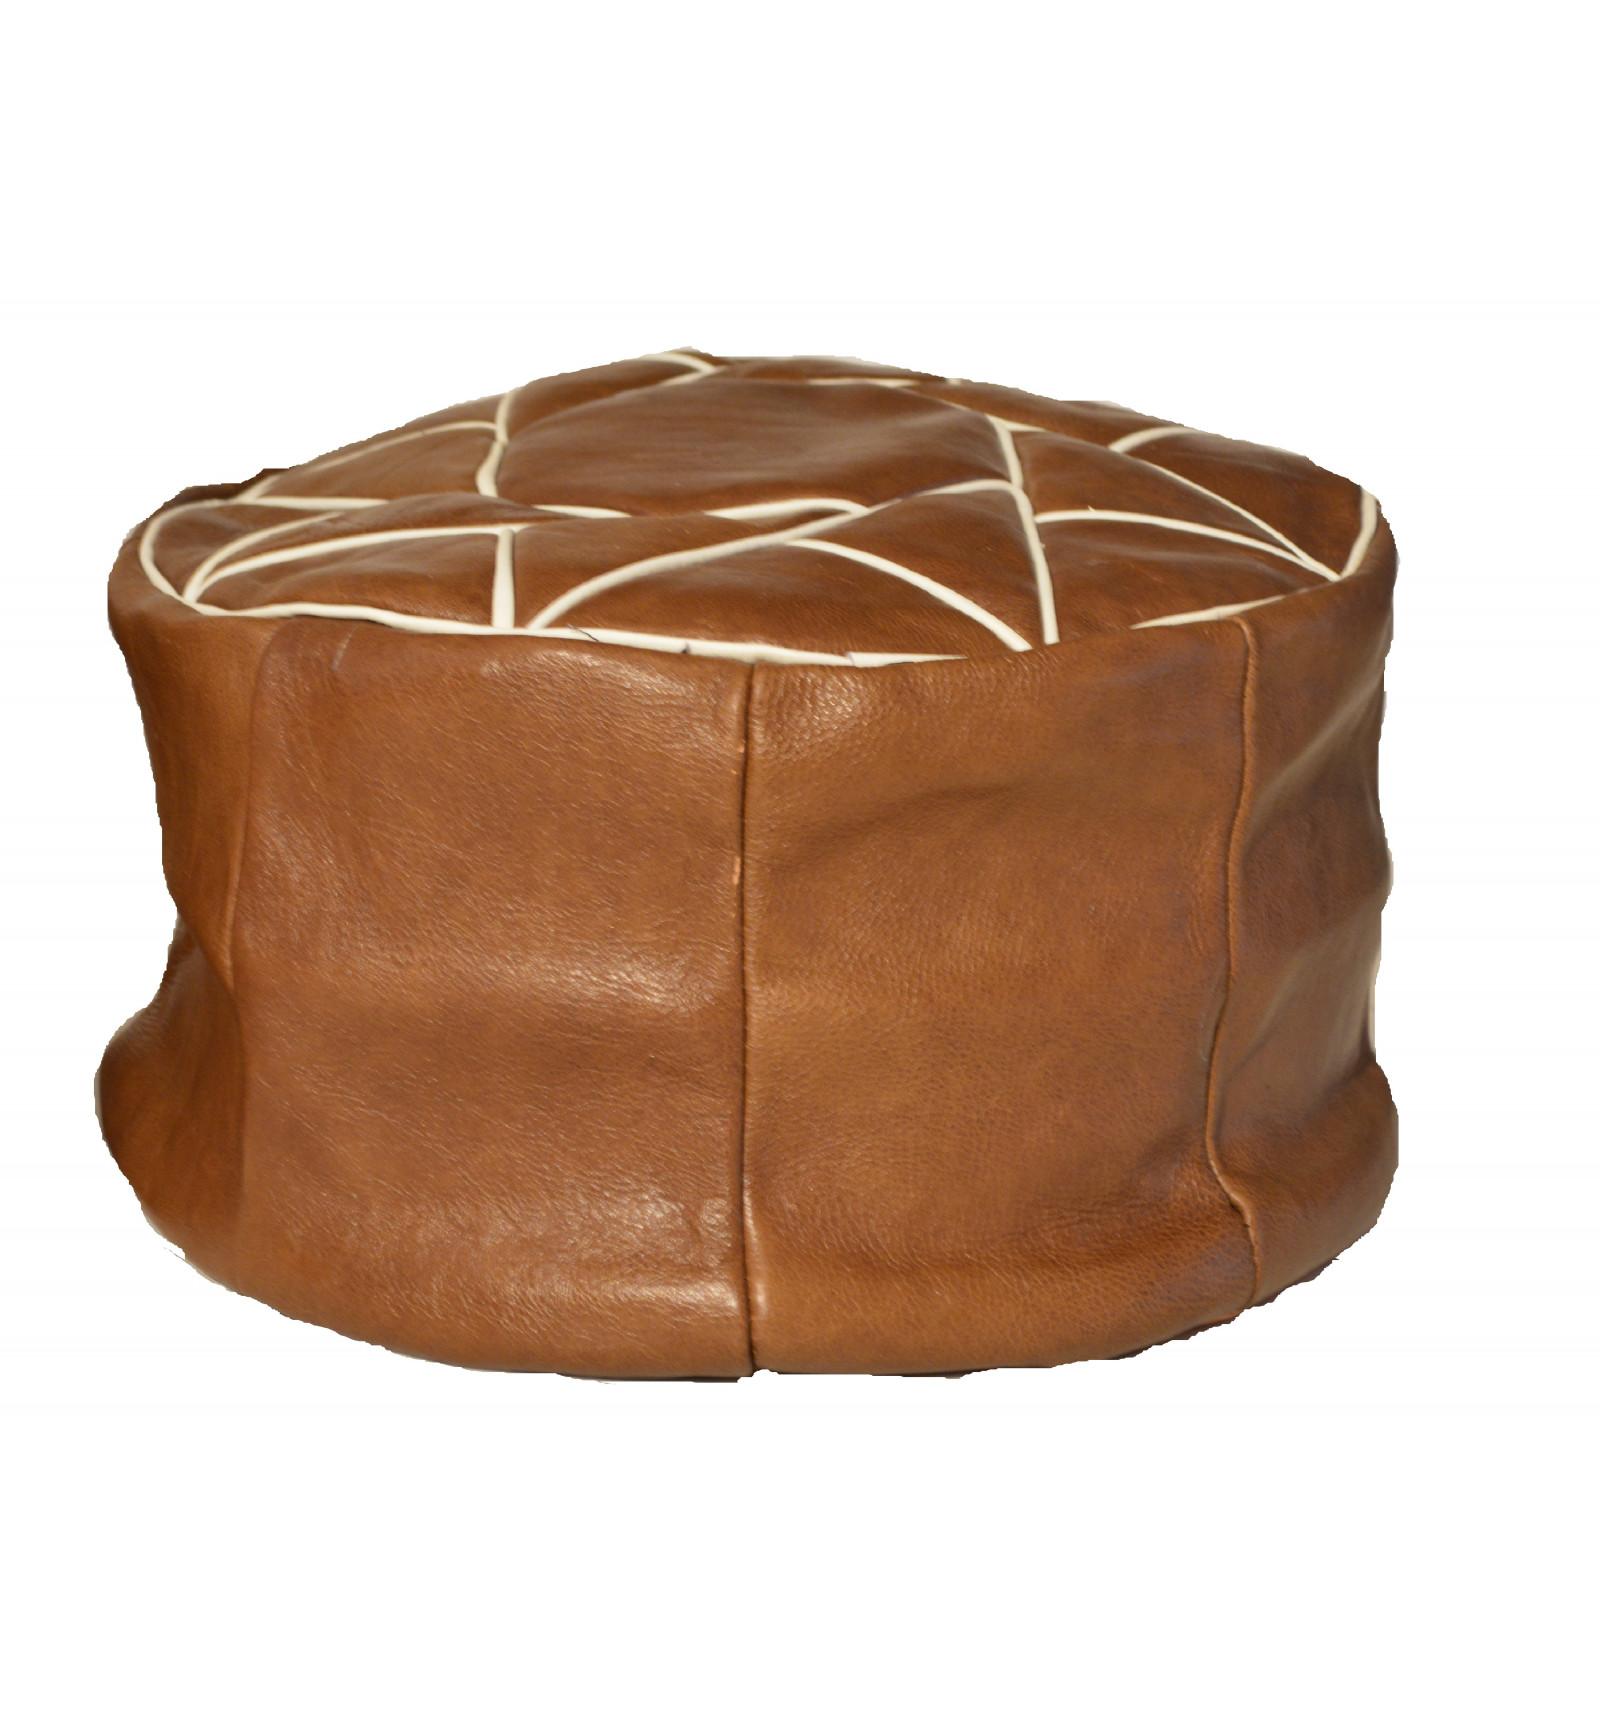 lot 3 pouf design pouf marocain en cuir marron lartisanet. Black Bedroom Furniture Sets. Home Design Ideas